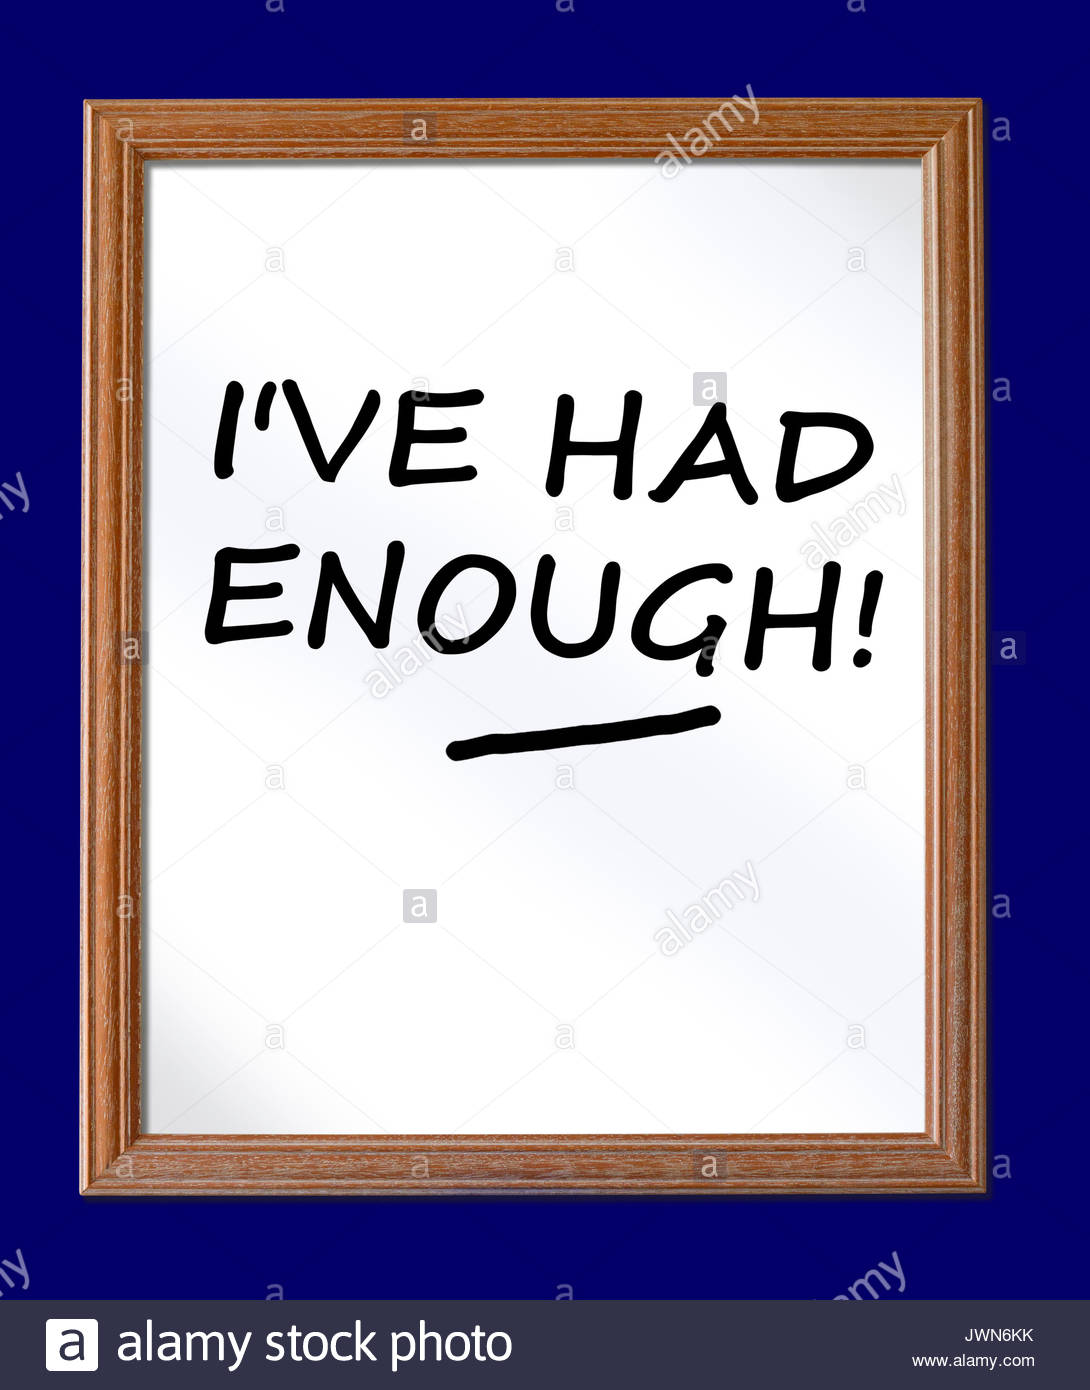 I've had Enough! written on a whiteboard, Blandford, Dorset, England - Stock Image